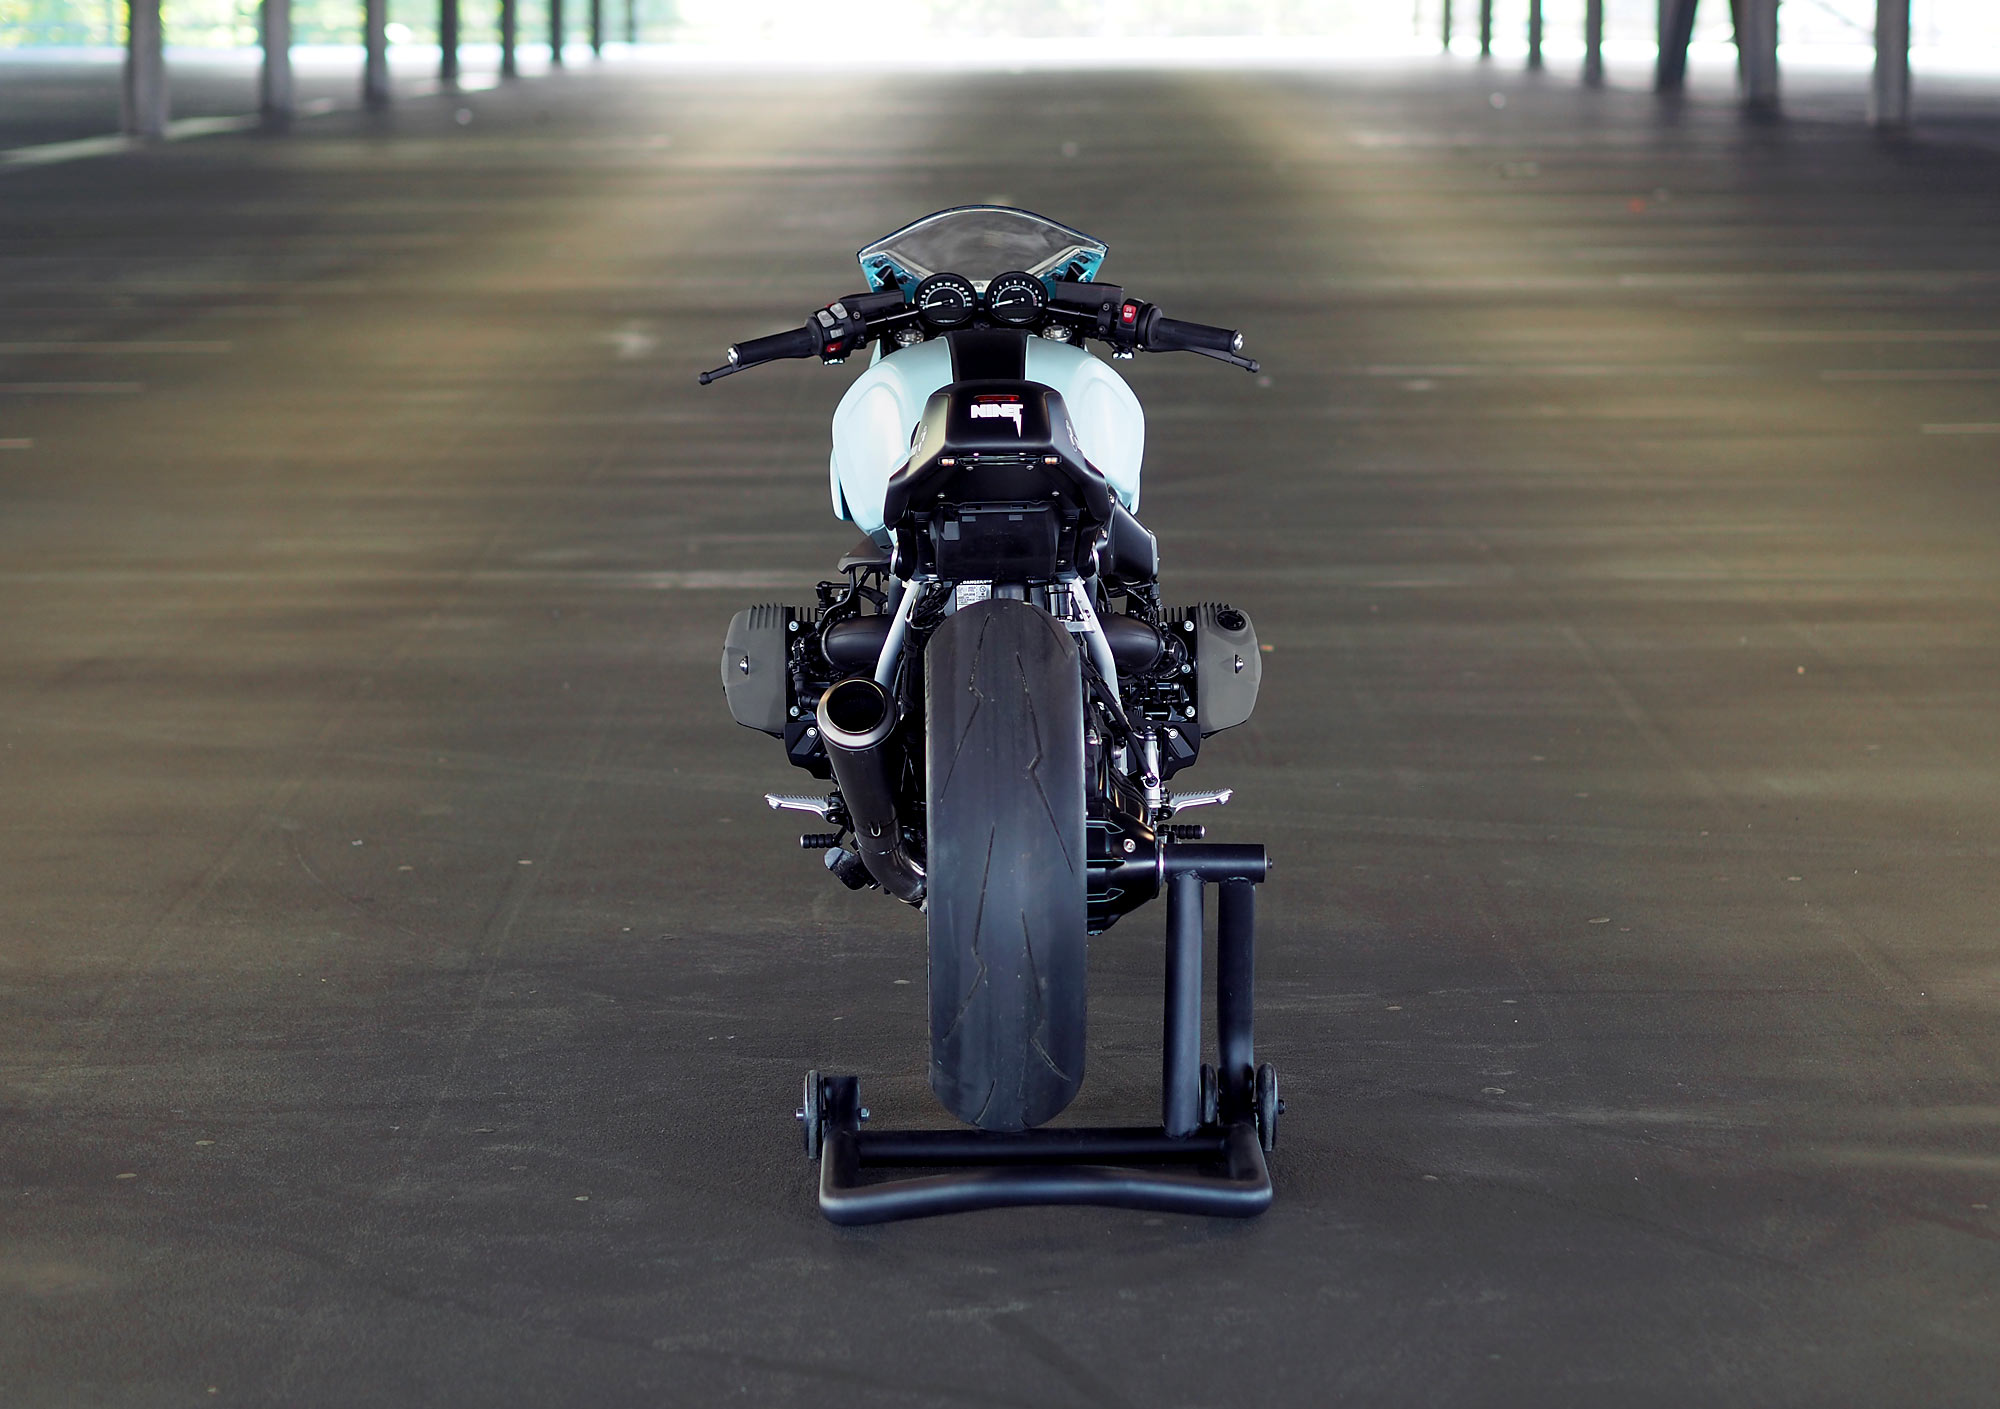 TWO MUCH  JVB Moto's BMW RnineT Racer - Pipeburn com